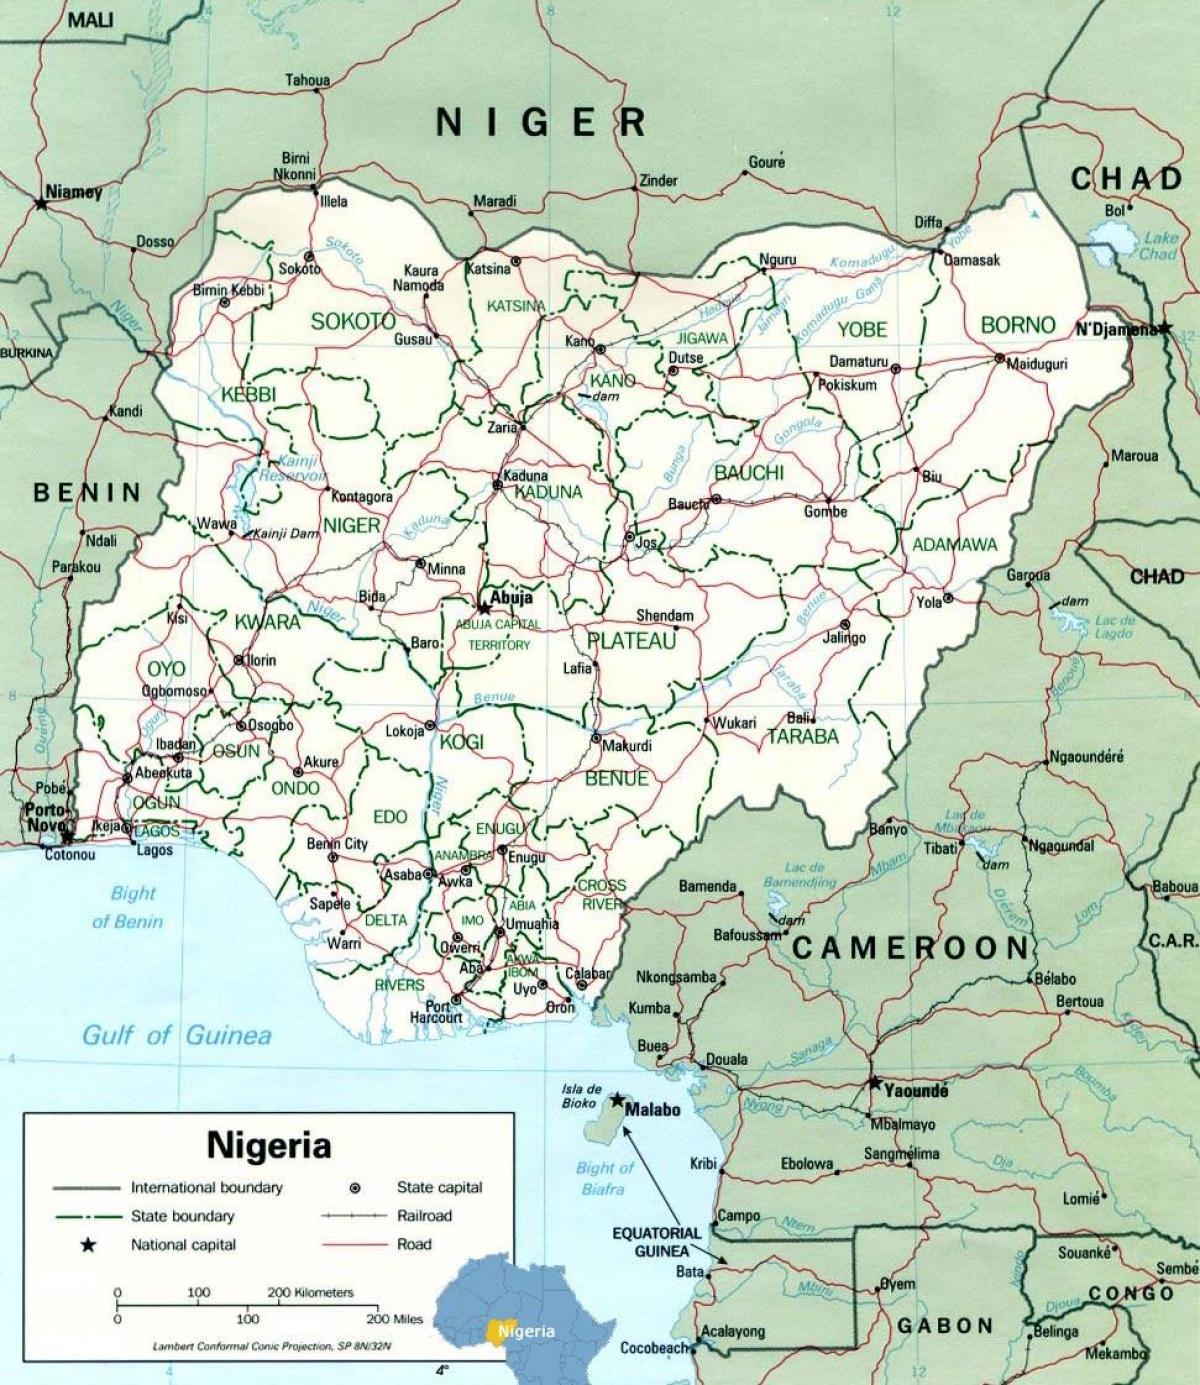 Lagos Nigeria World Map.Lagos Nigeria Map Lagos Nigeria Map Africa Western Africa Africa